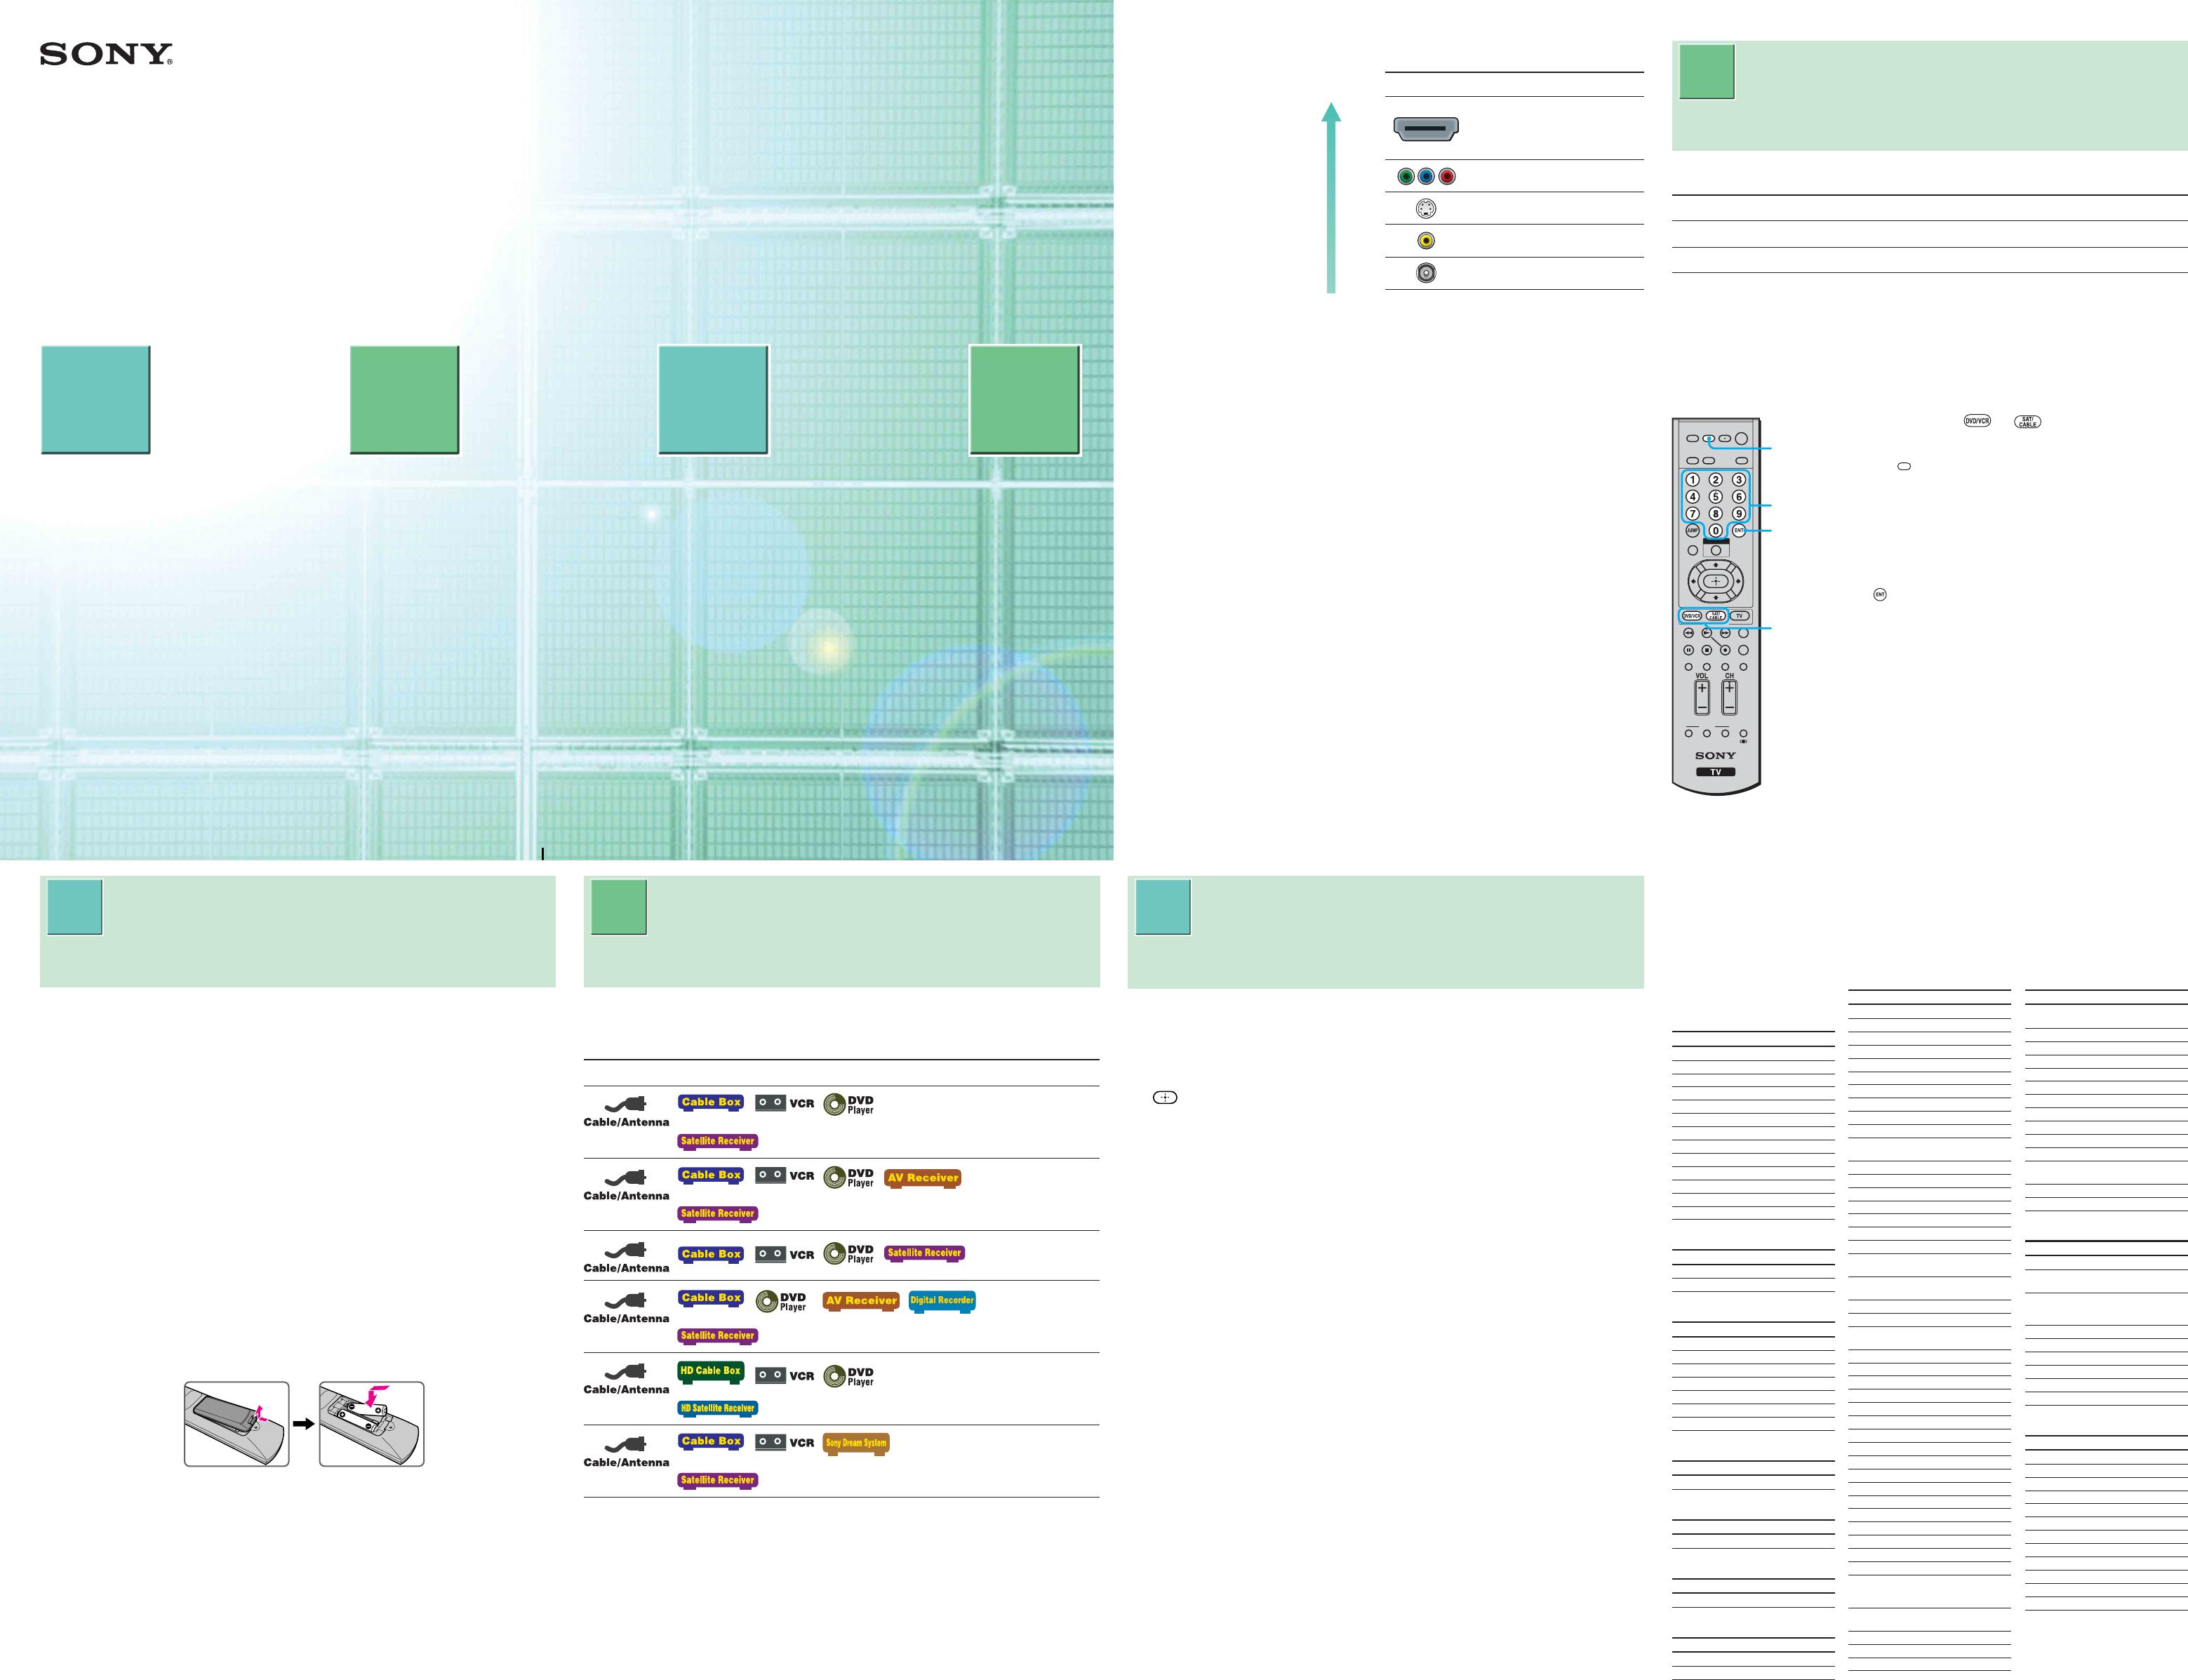 Sony Wega Gatetm Klv S23A10 Users Manual S19/23/26/32A10